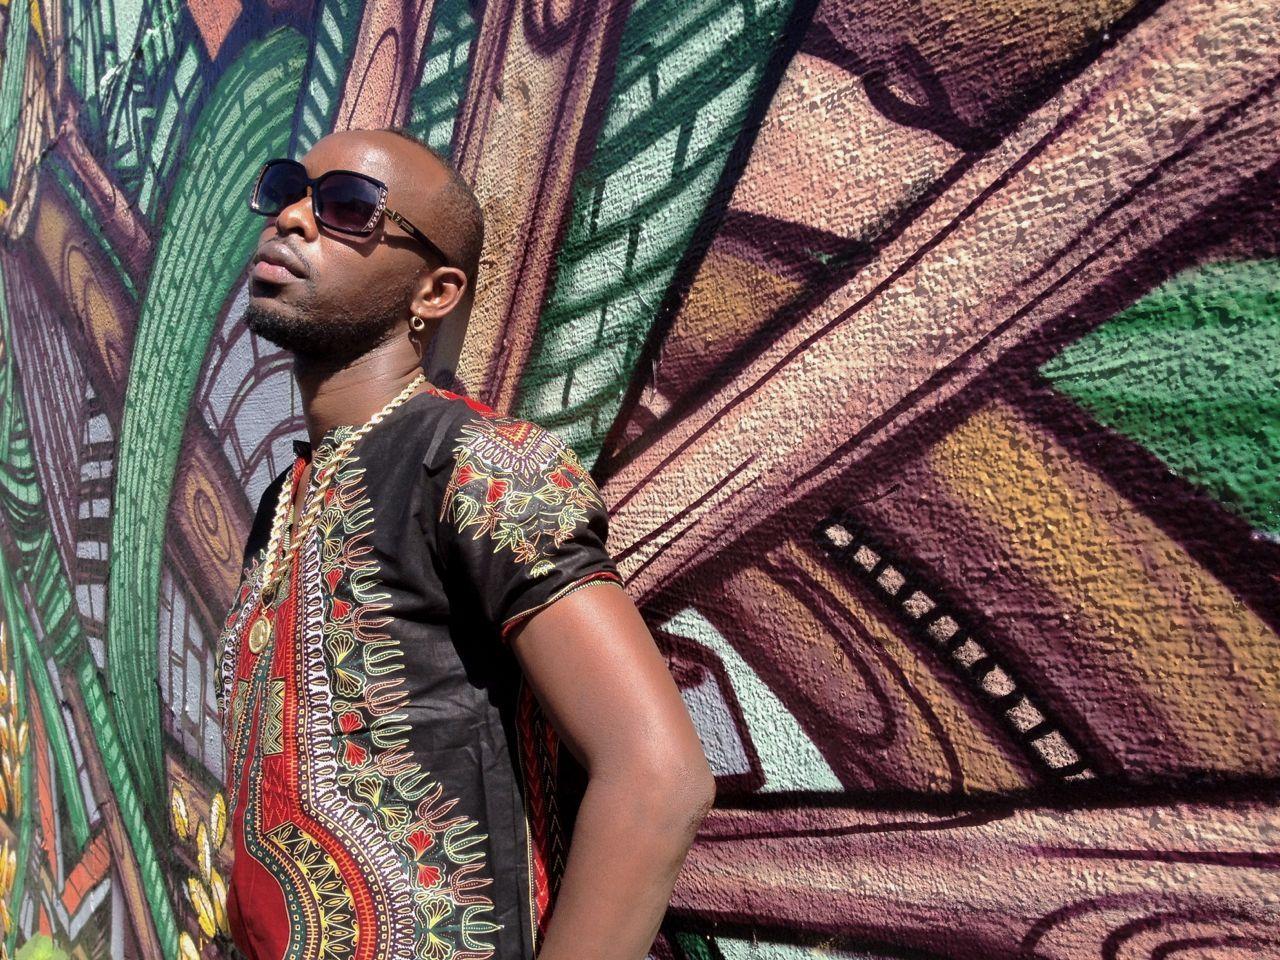 Eddy Kenzo with Brooklyn street art | PVI Artist